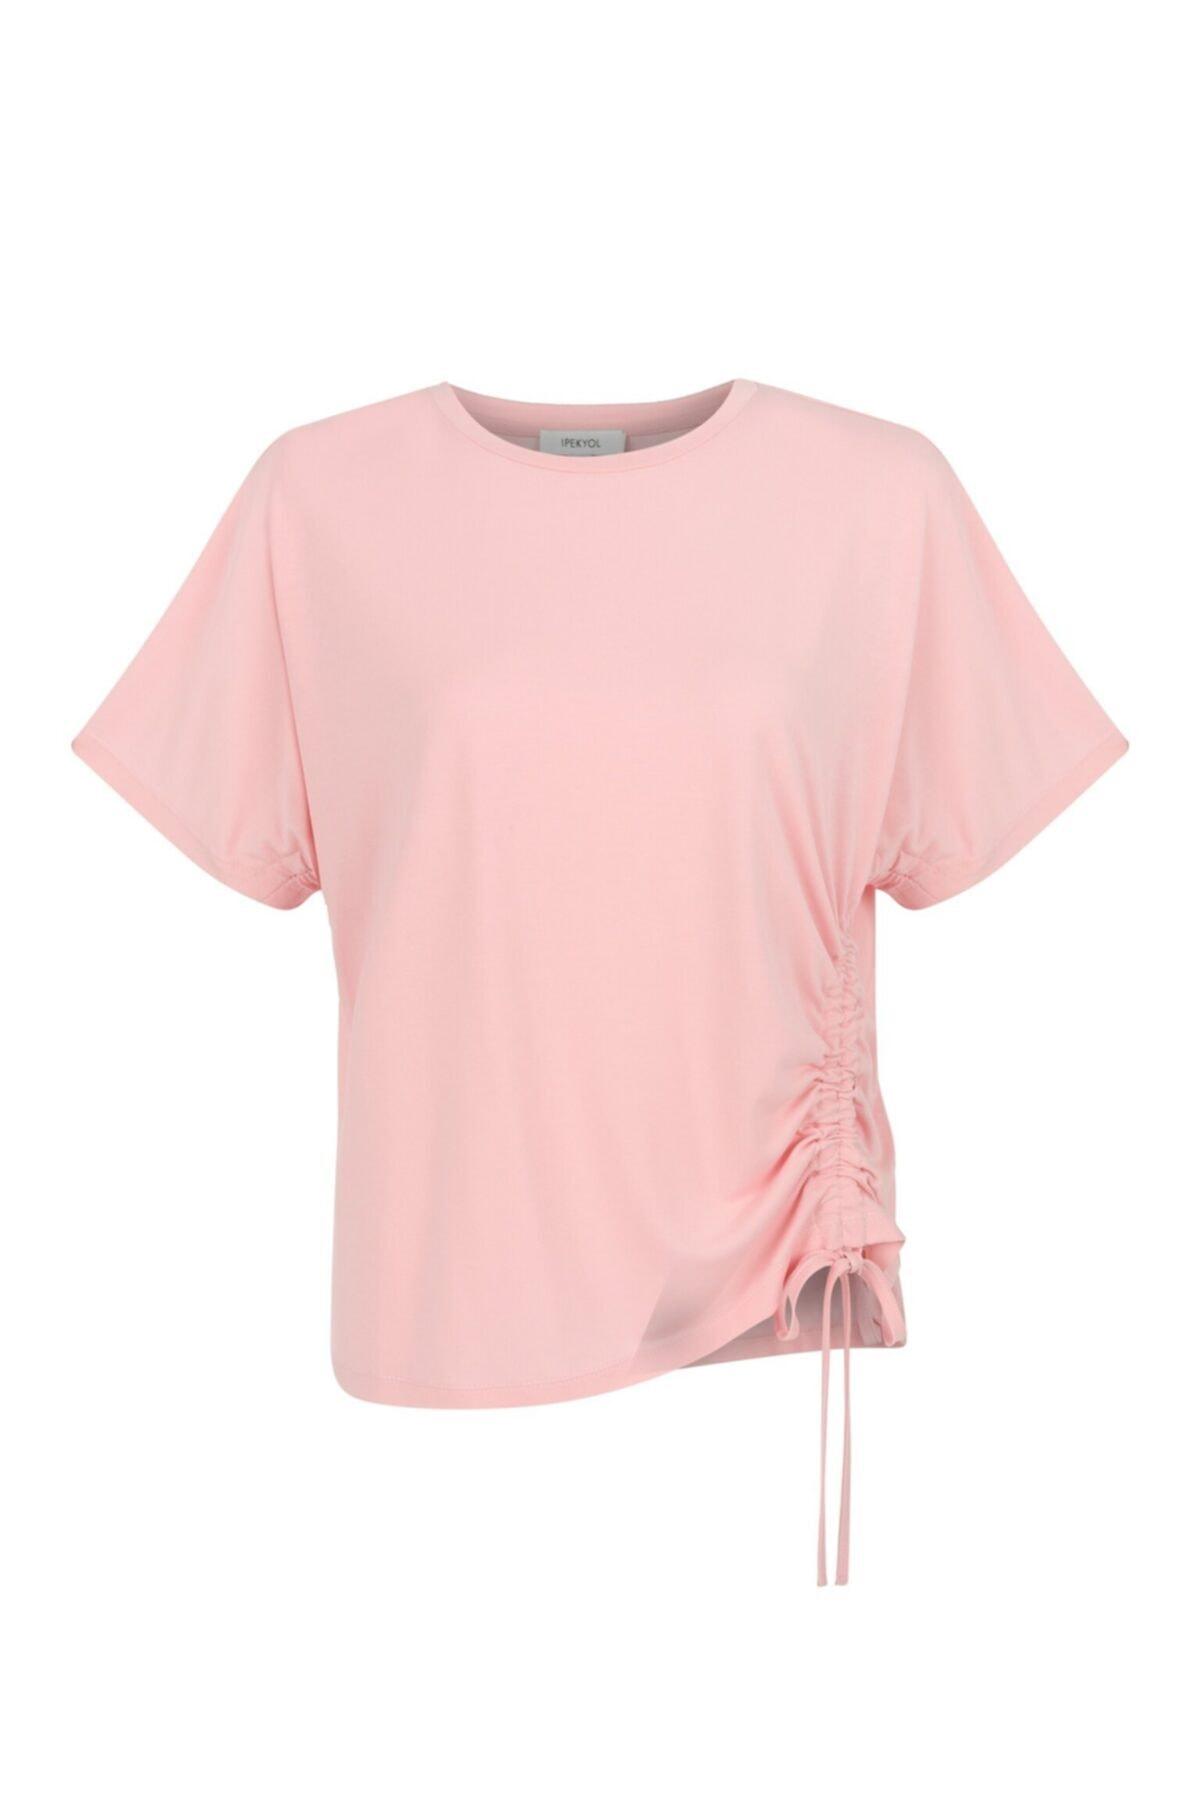 İpekyol Ayarlanabilir Bel Tshirt